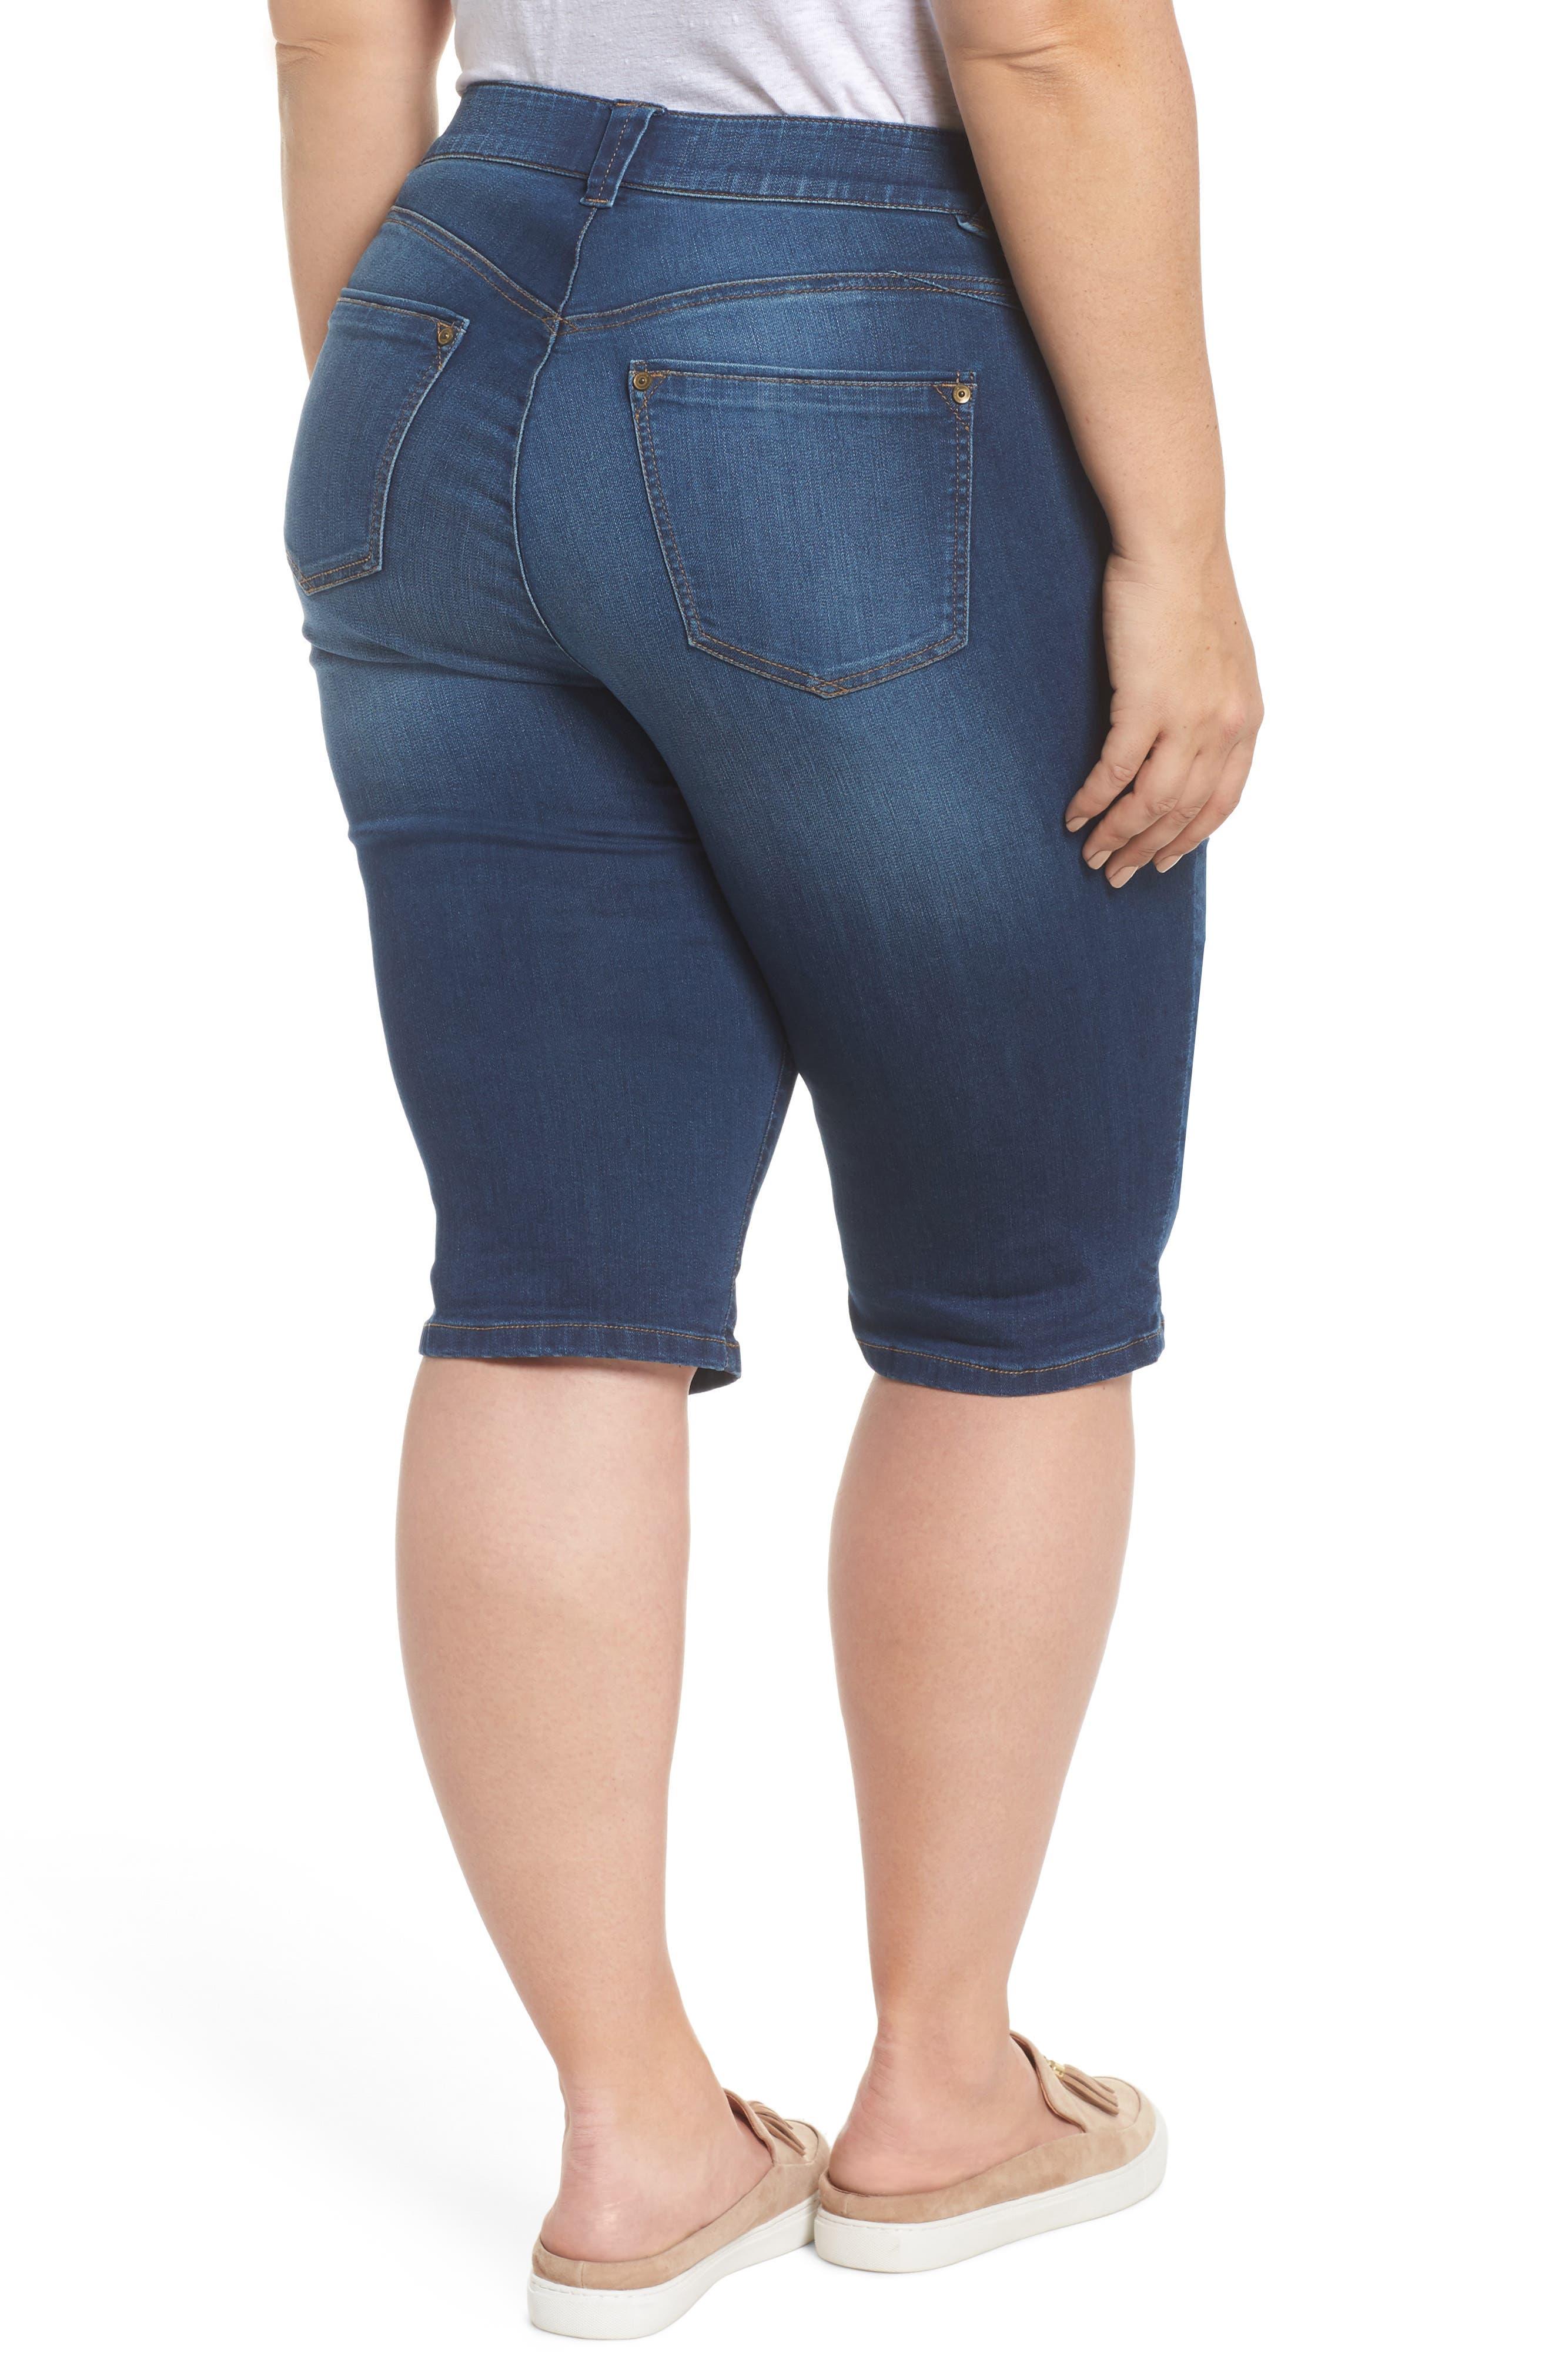 Ab-solution Denim Bermuda Shorts,                             Alternate thumbnail 2, color,                             Blue